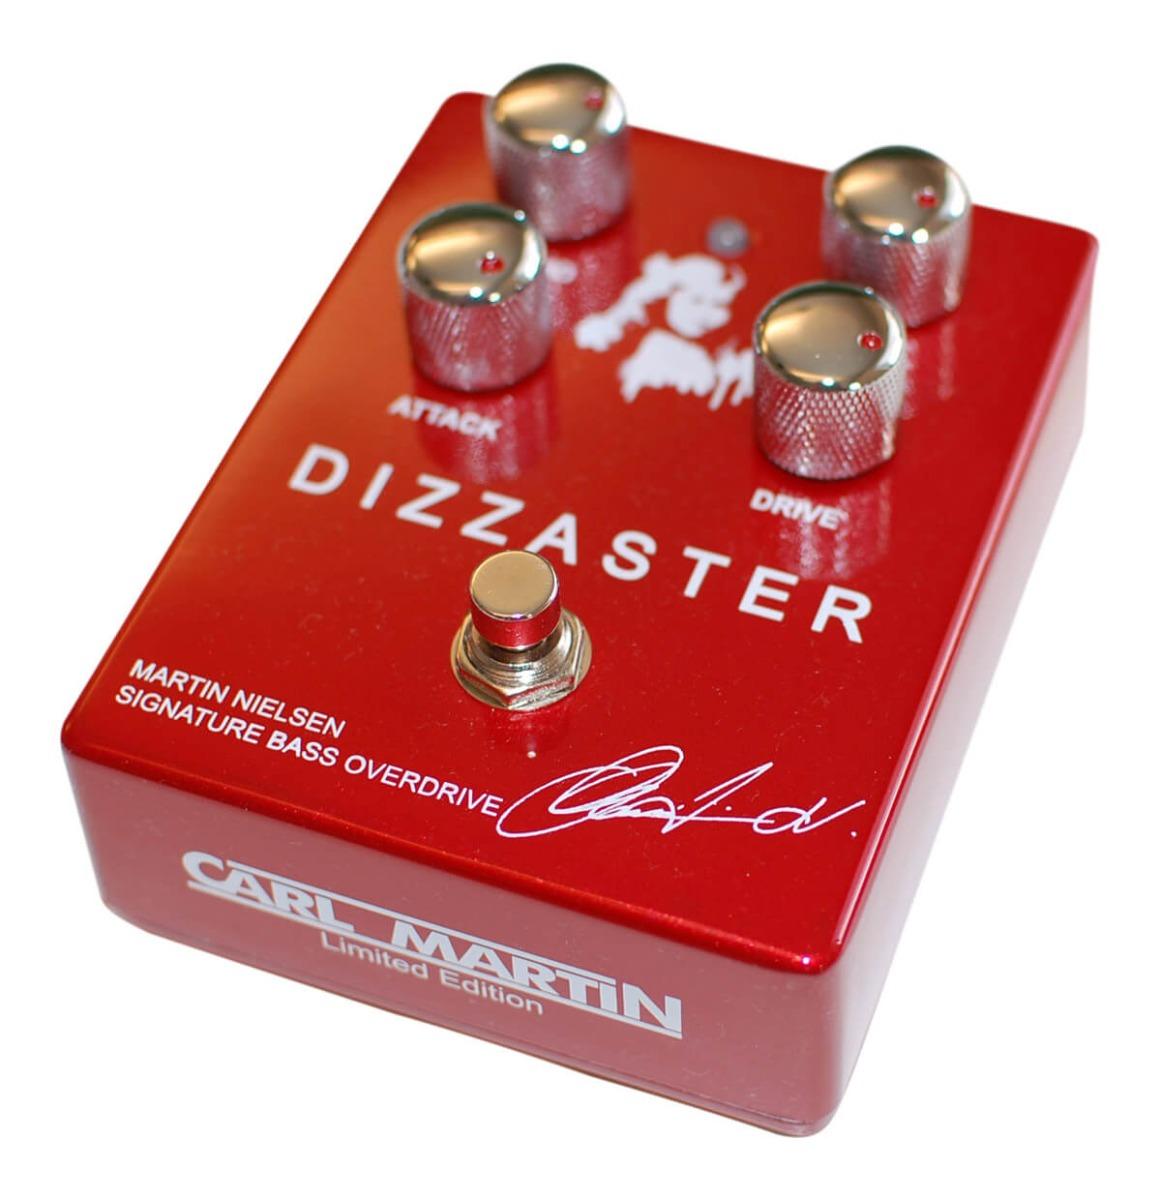 Image of   Carl Martin Dizzaster - Martin Nielsen Signature bass overdrive